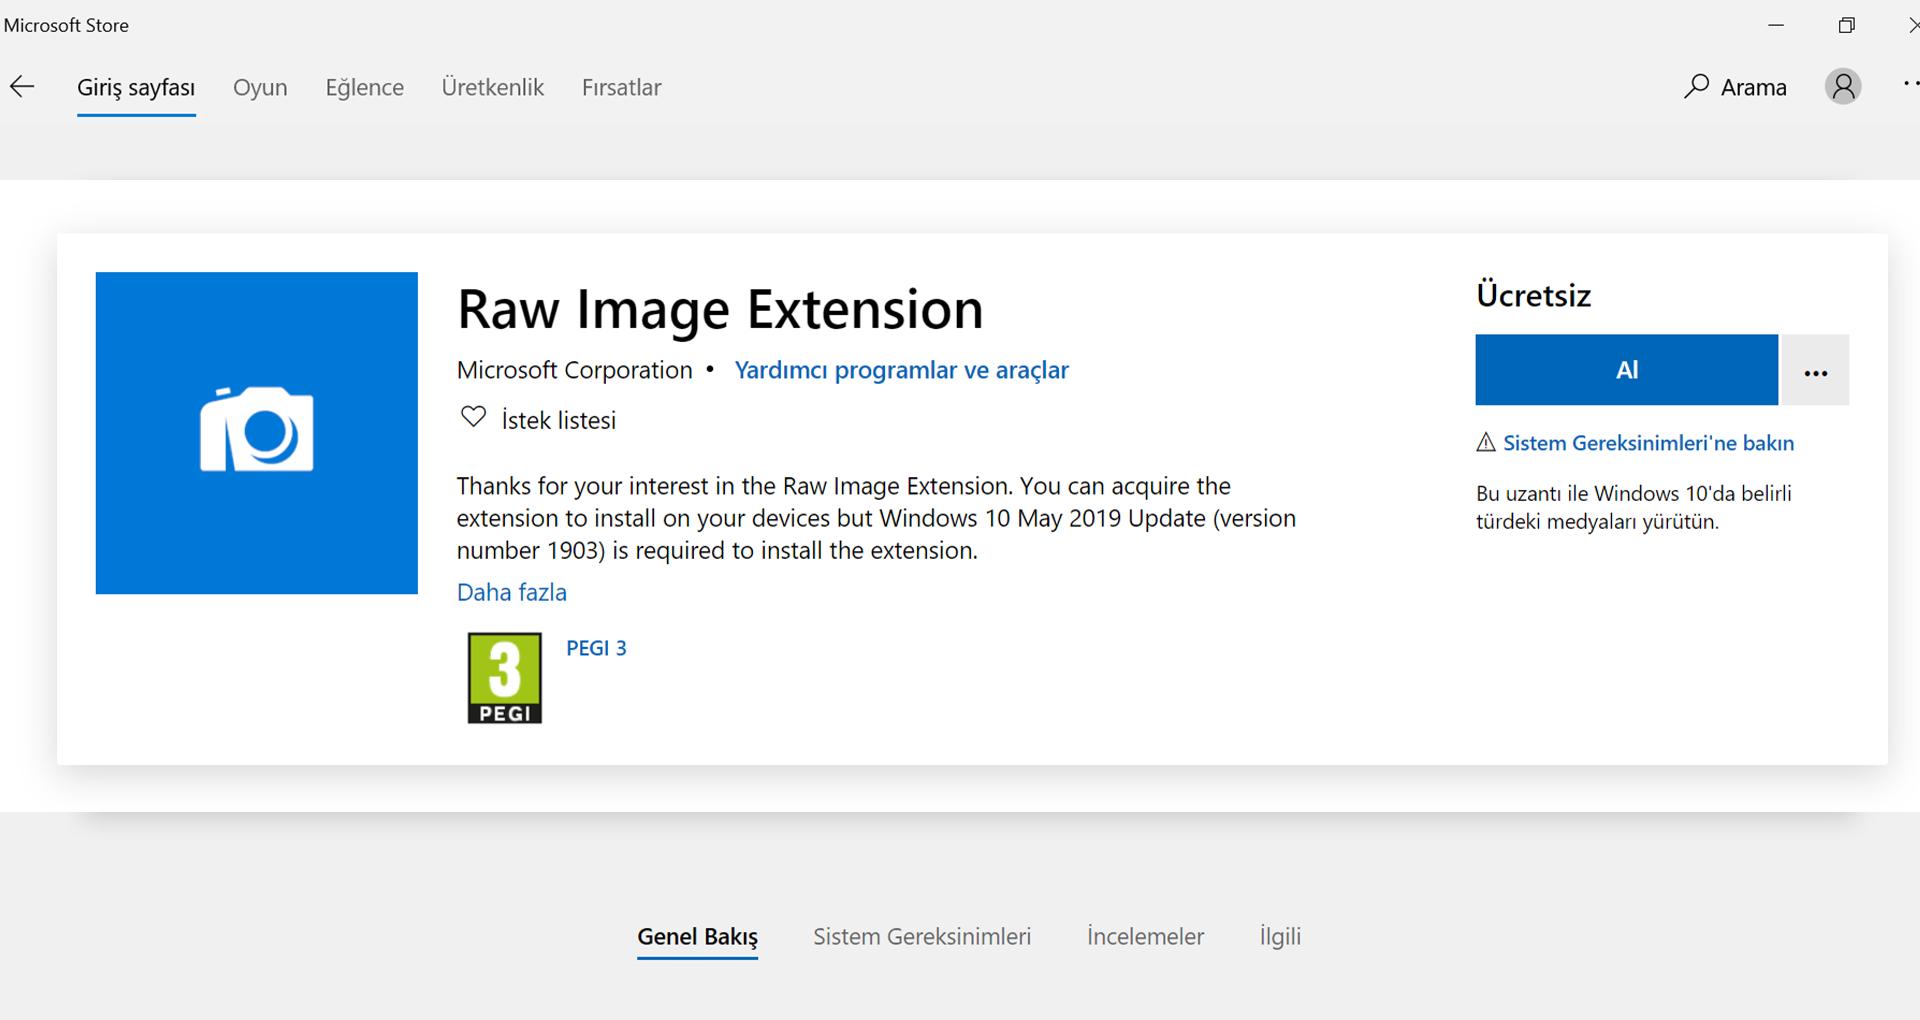 Microsoft Stor'dan Raw Images Extension'ı Ücretsiz Al Sayfası